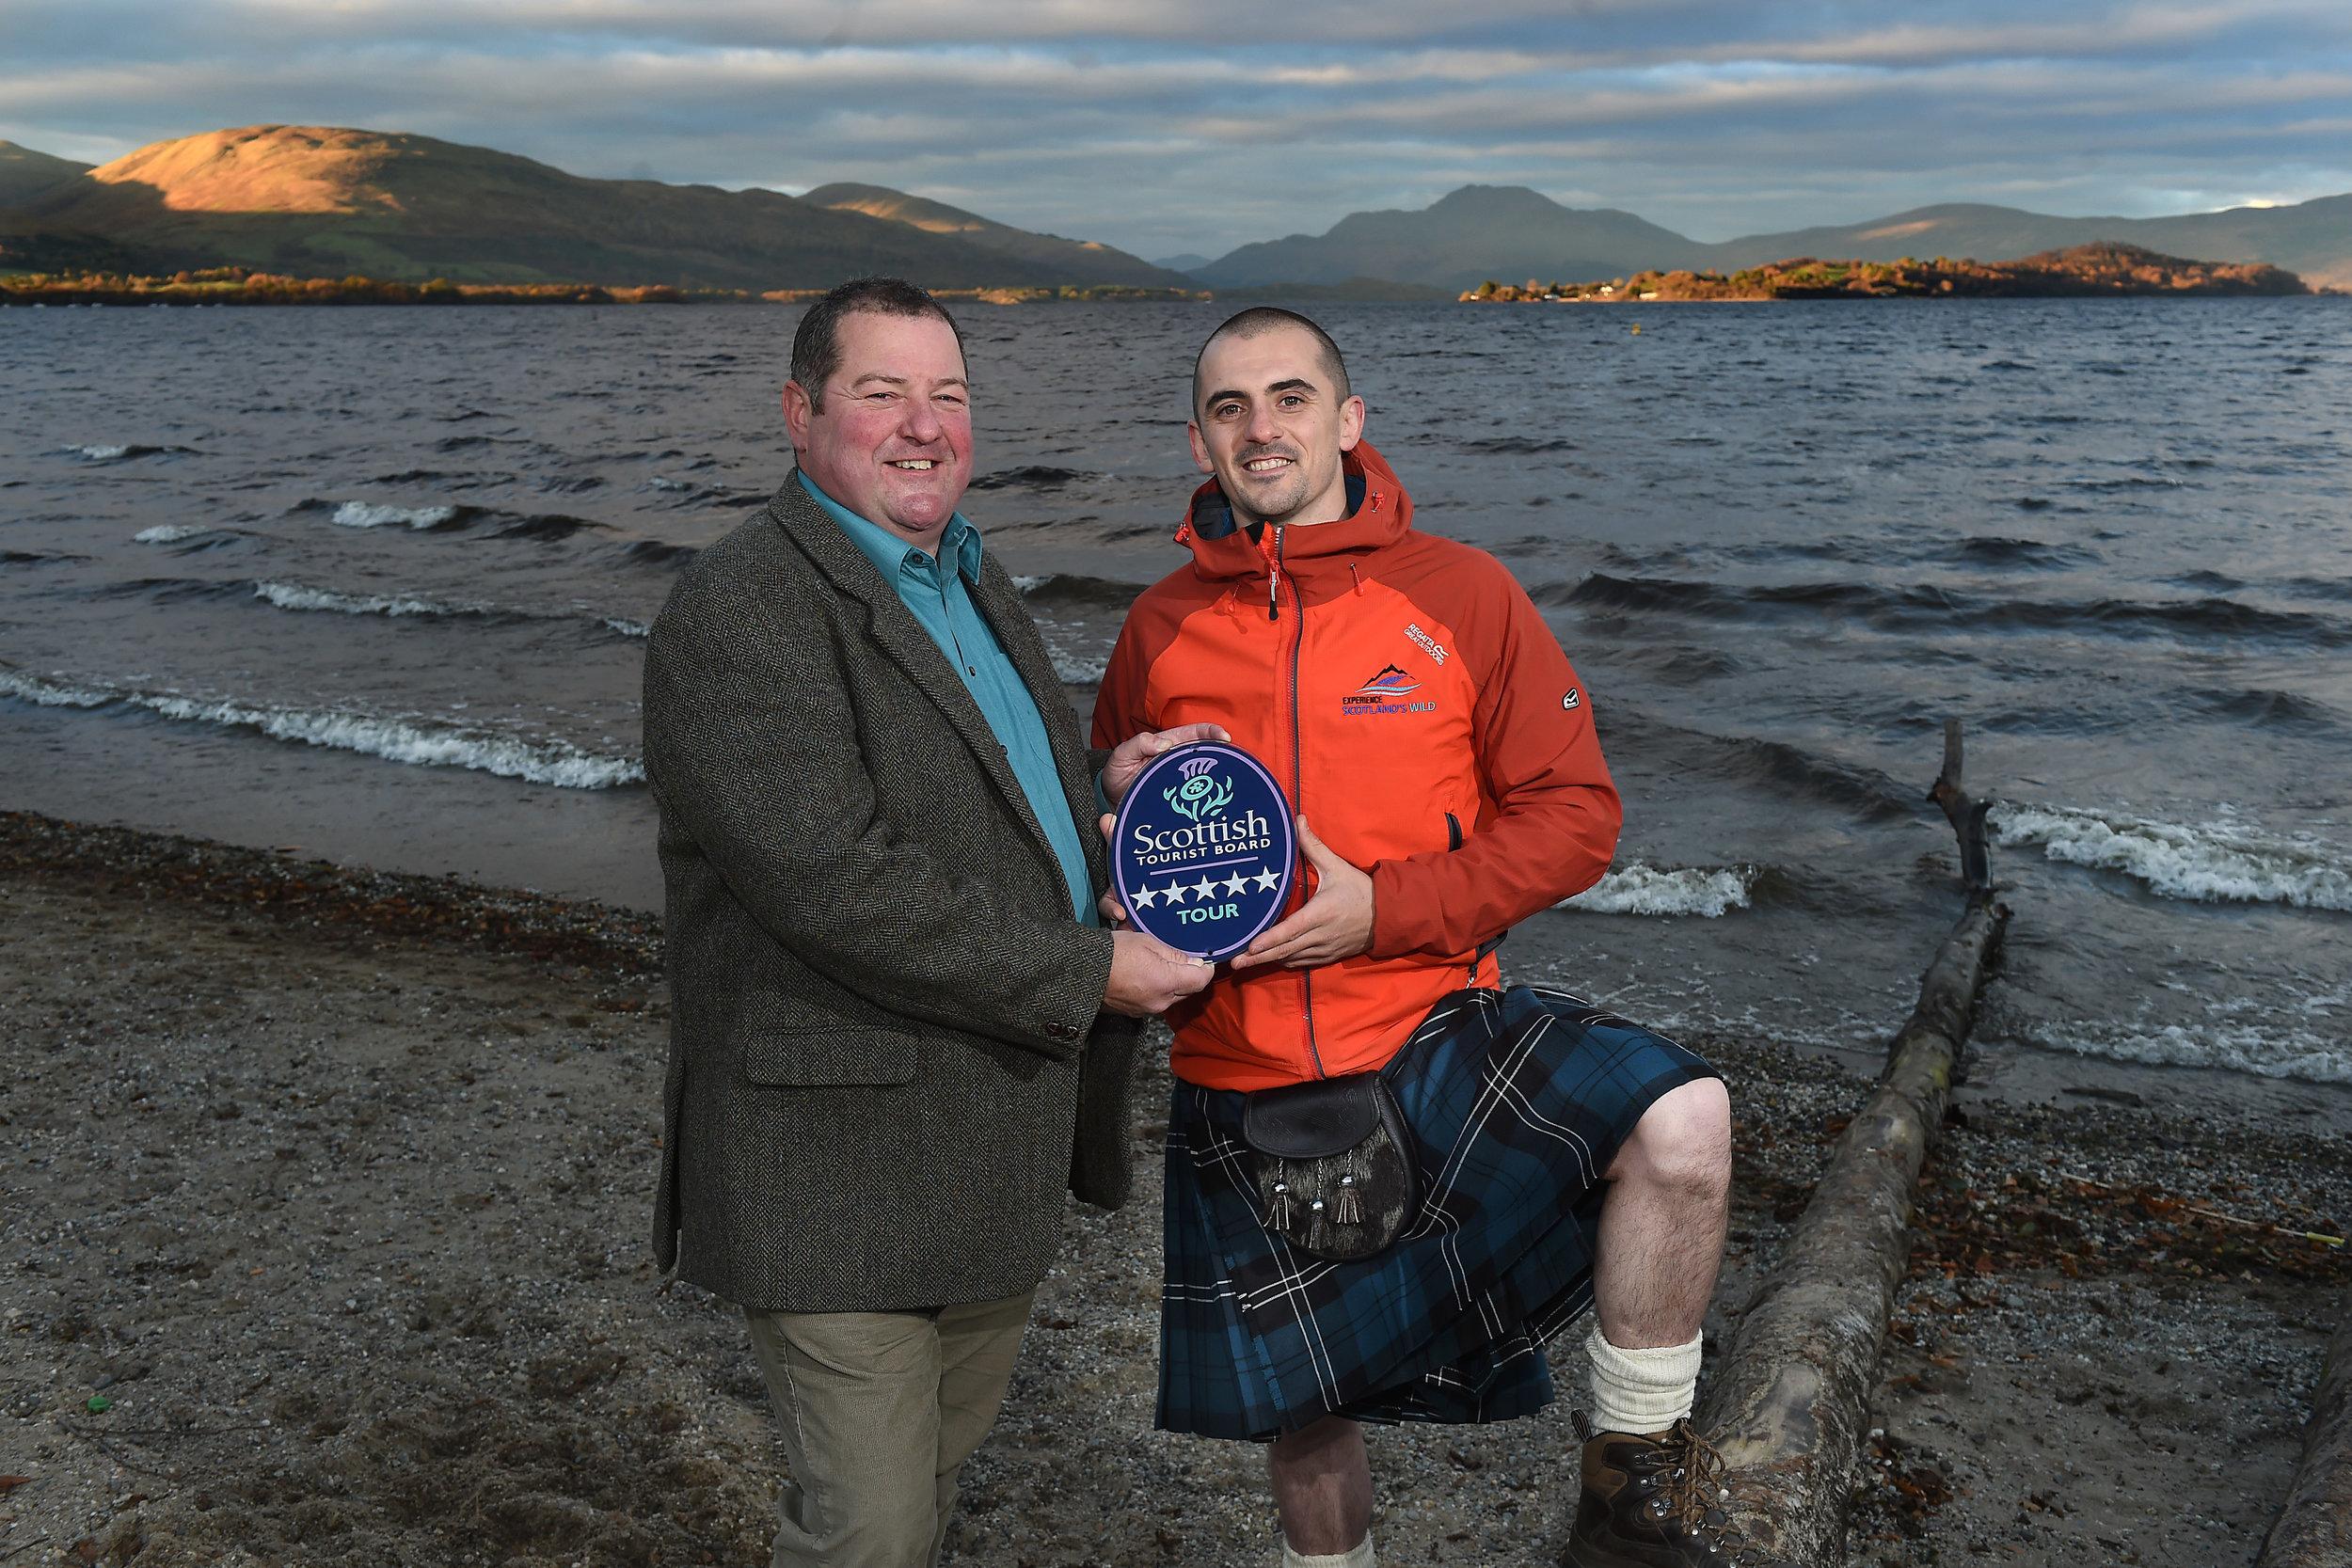 scotland's wild receiving 5 star award.jpg